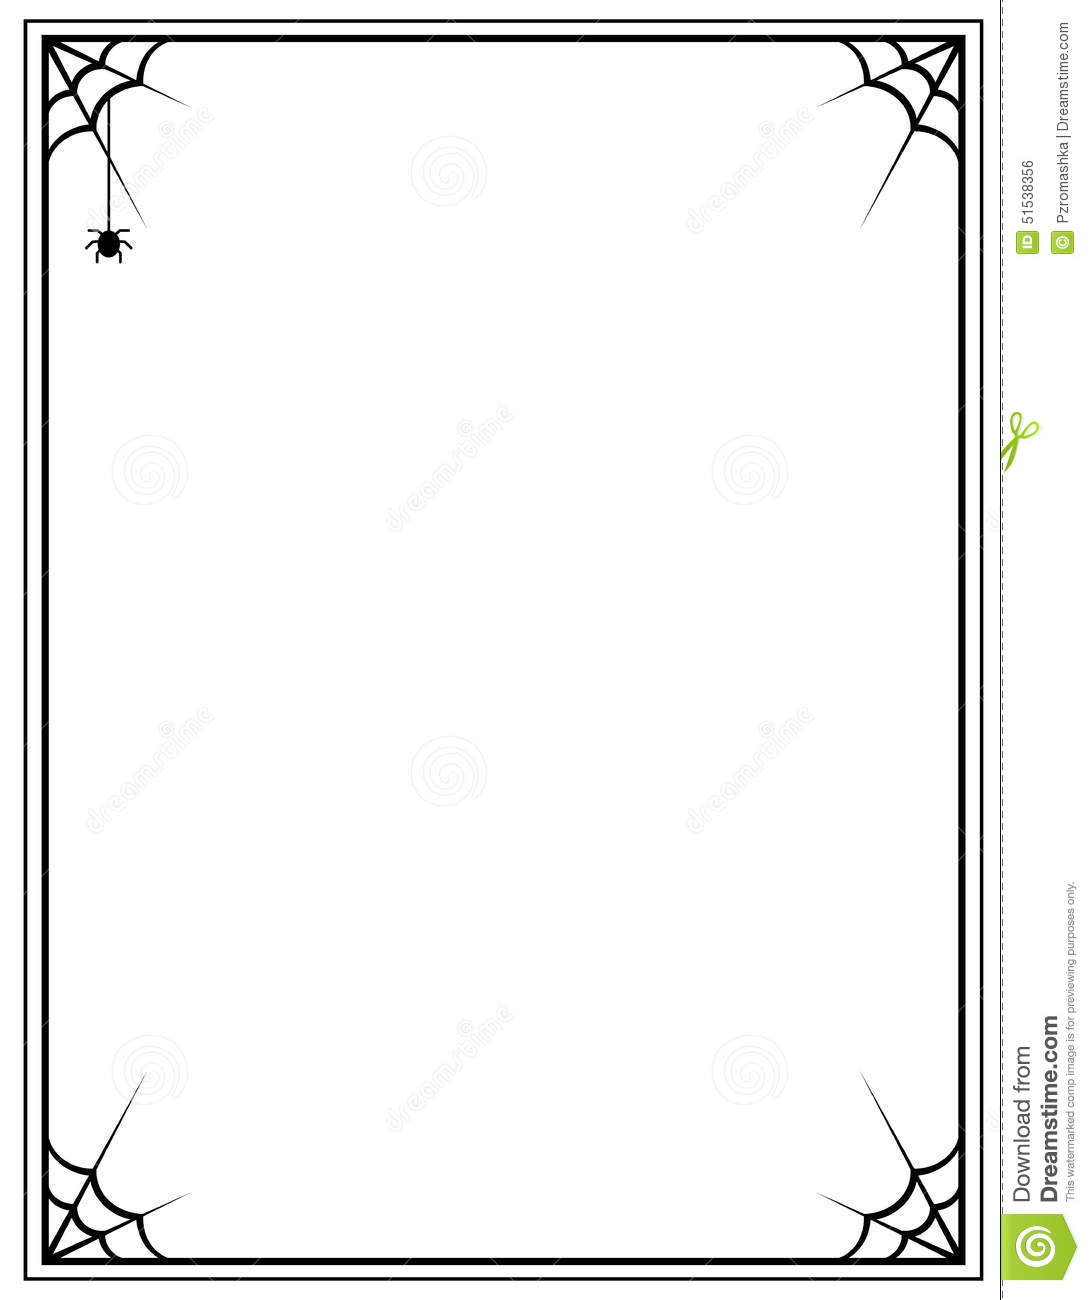 Spider Web clipart frame #4